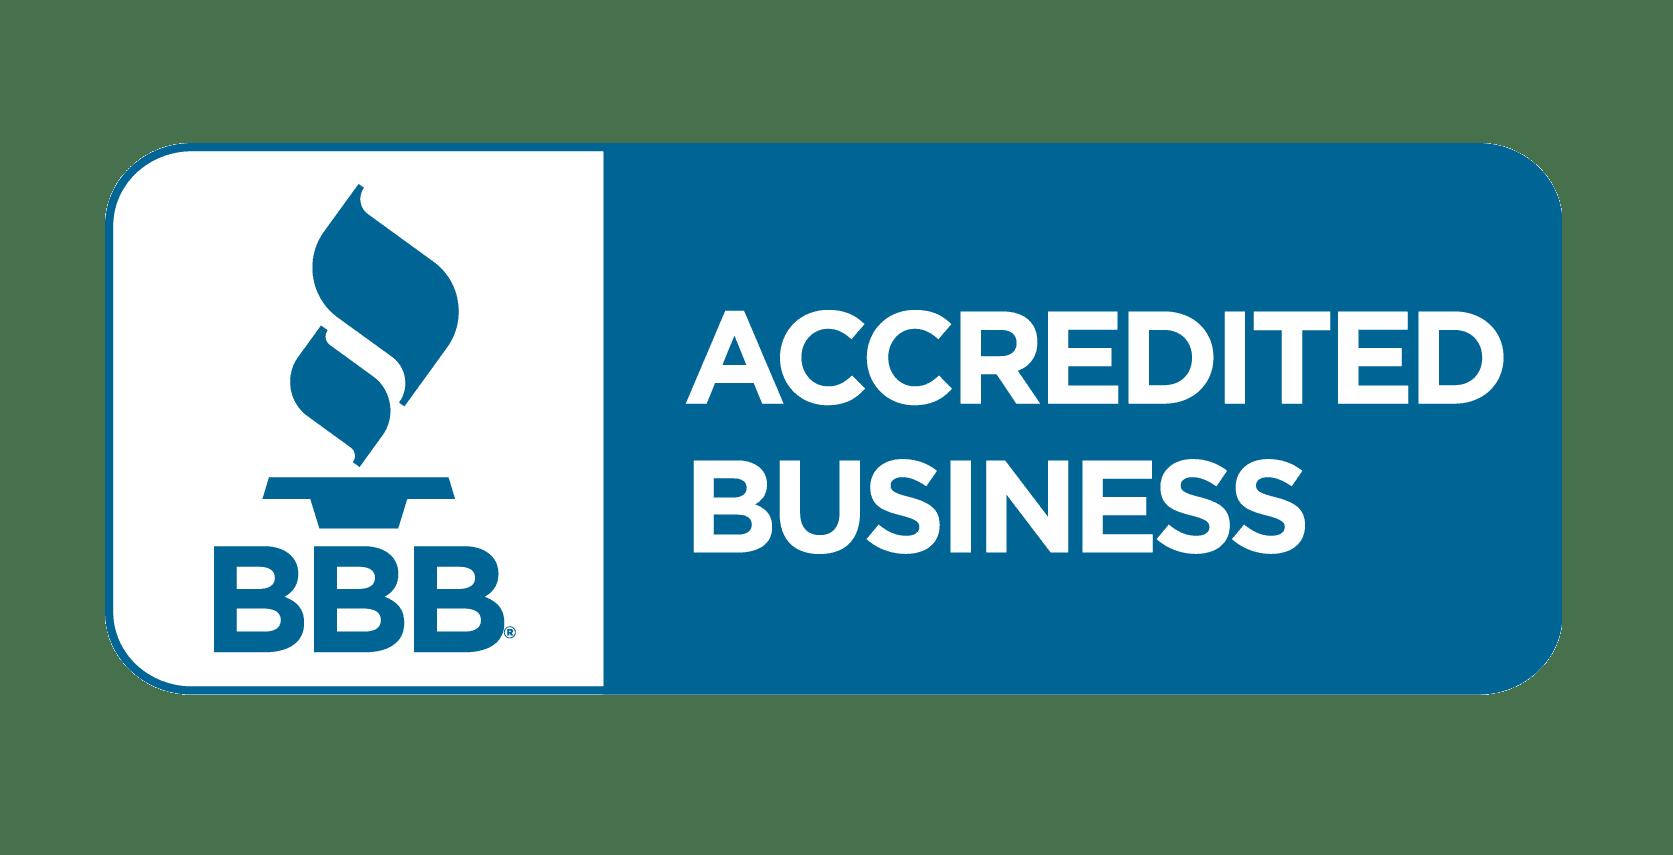 Kemper Carpet & Flooring is accredited by the Better Business Bureau in Oakton, VA